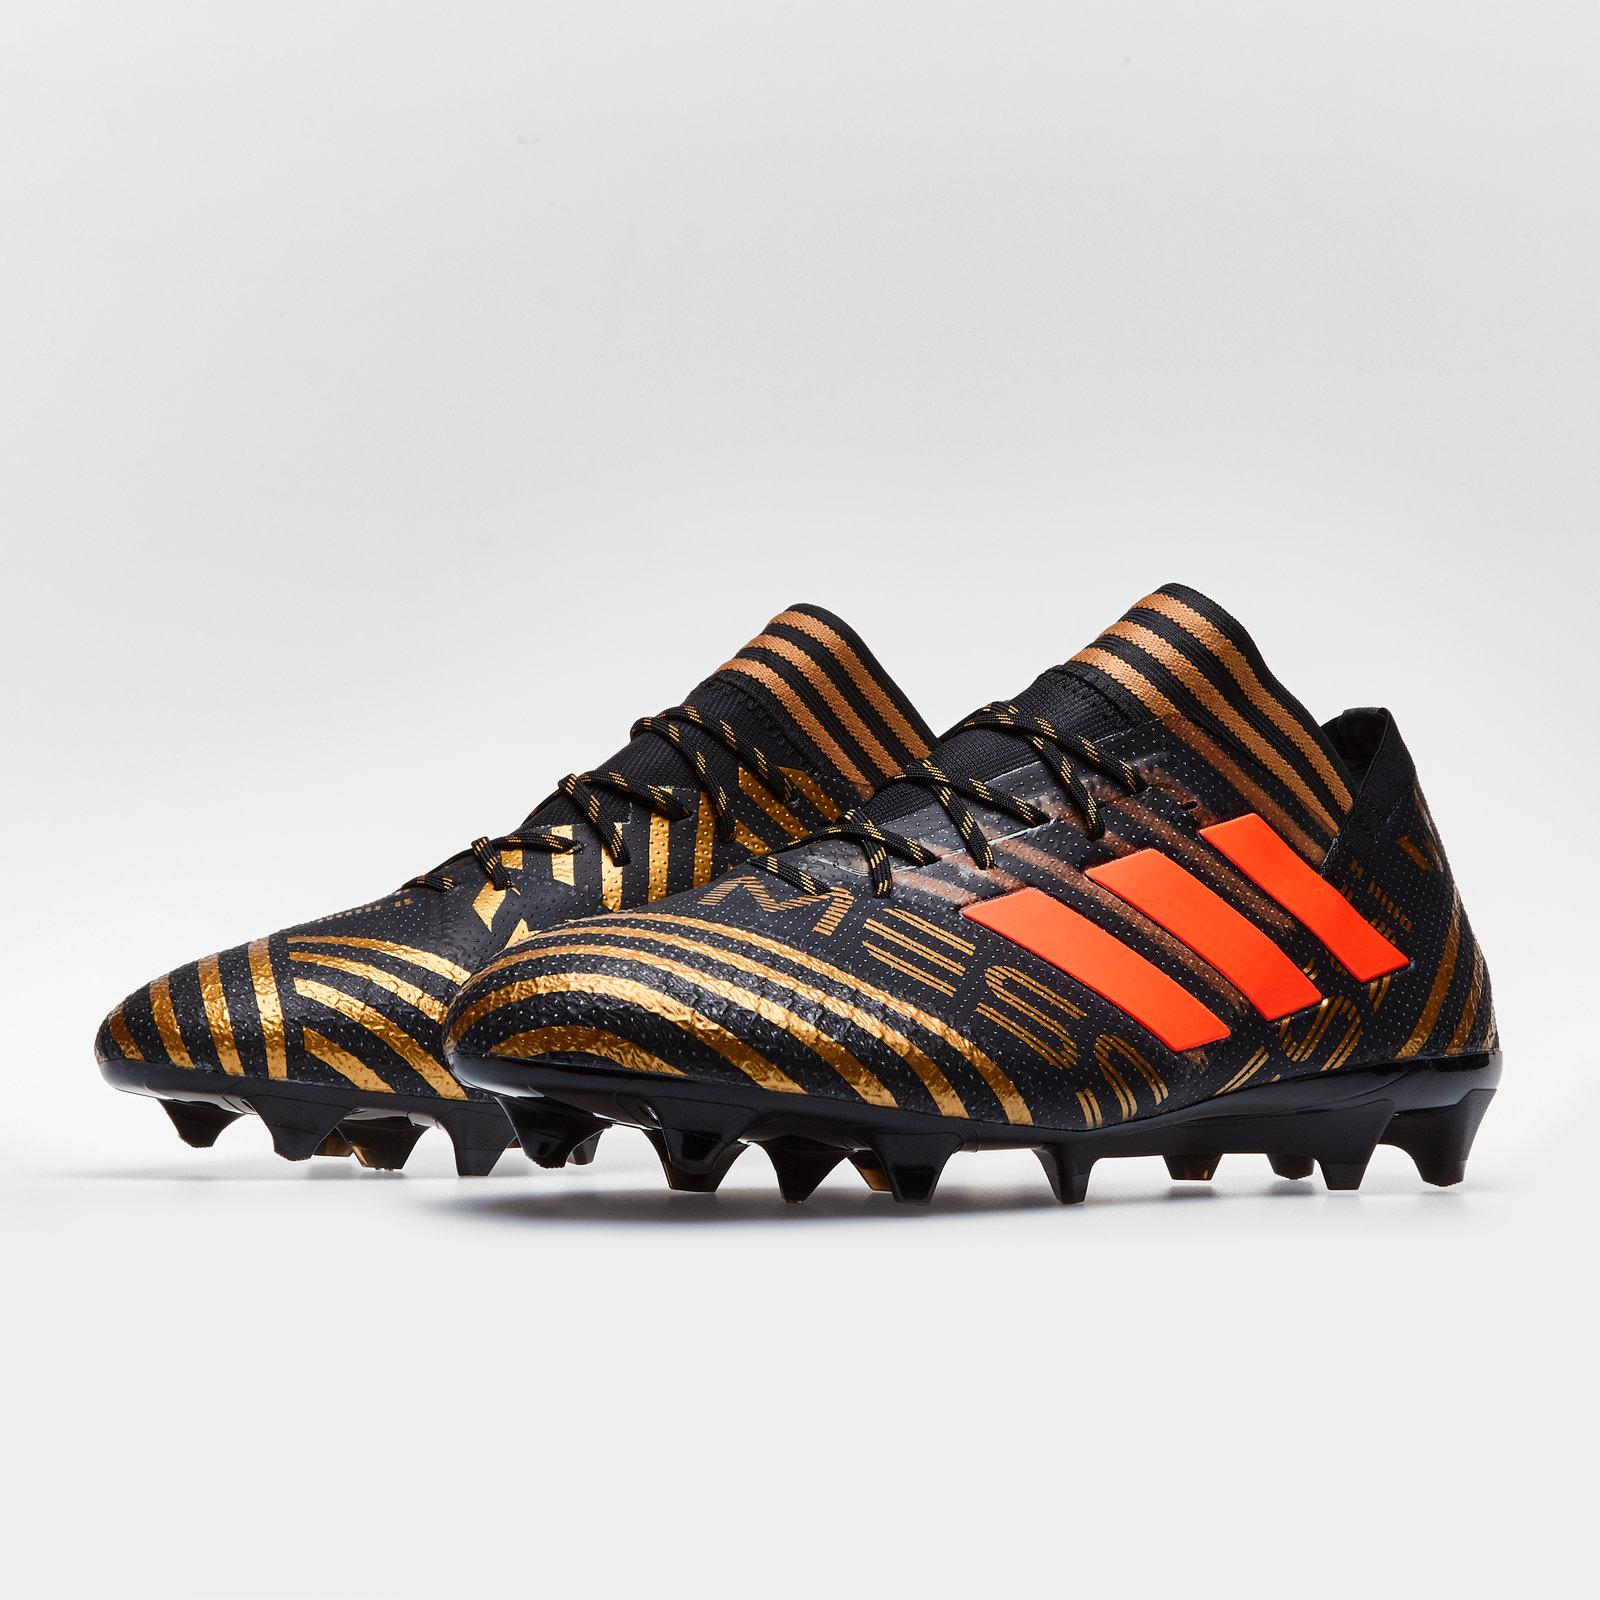 be331eec69c4 Details about adidas Mens Nemeziz Messi 17.1 SG Football Boots Studs Sports  Trainers Black